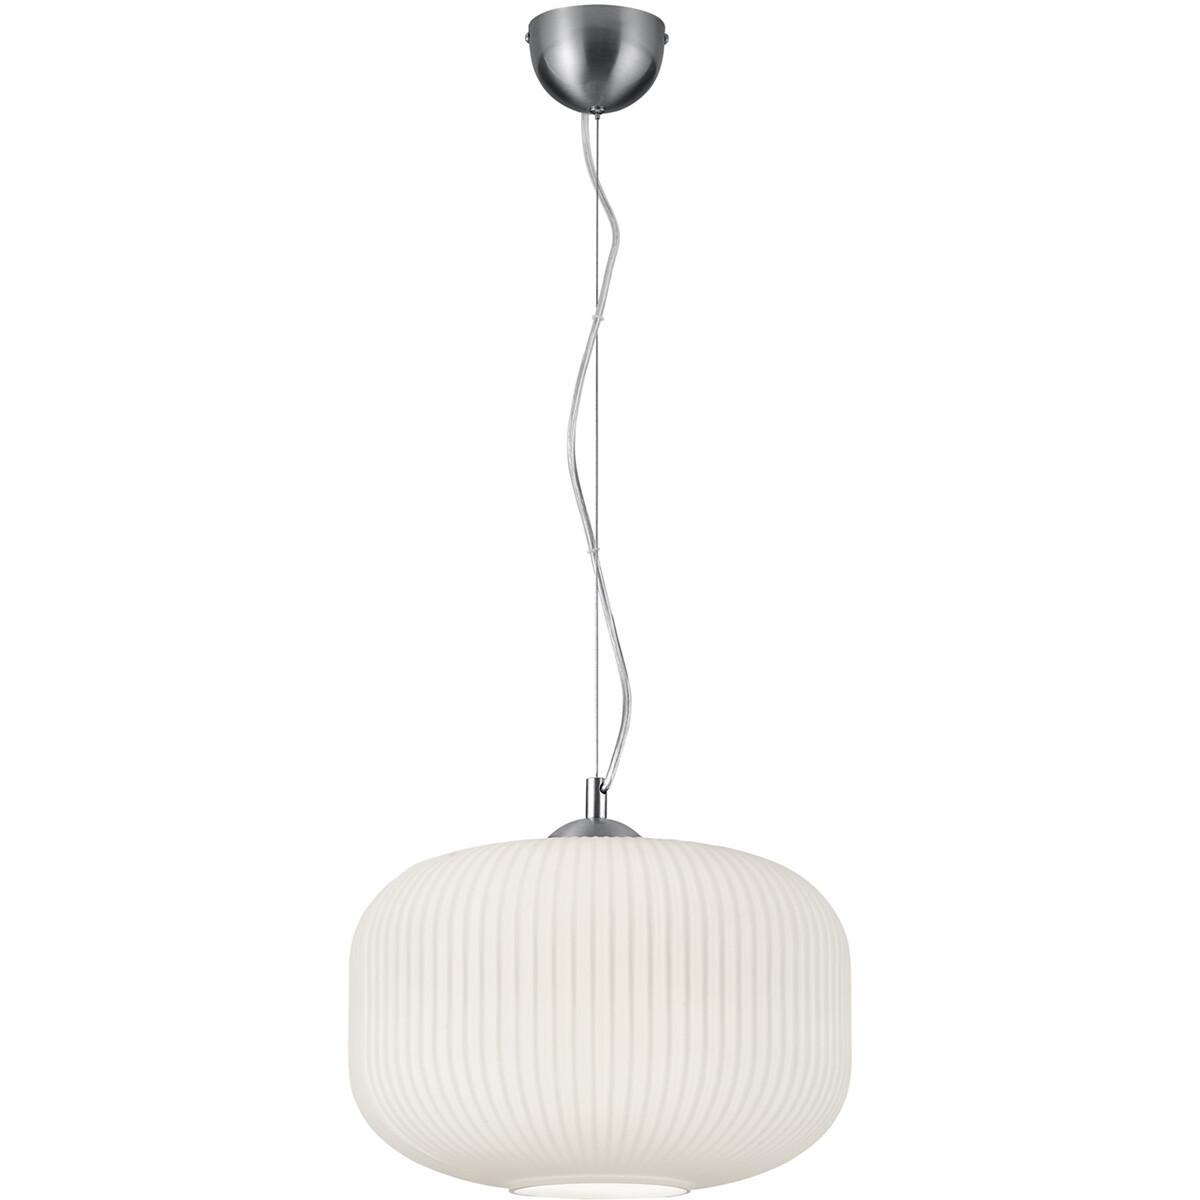 LED Hanglamp - Hangverlichting - Trion Konpo - E27 Fitting - Rond - Mat Wit - Aluminium